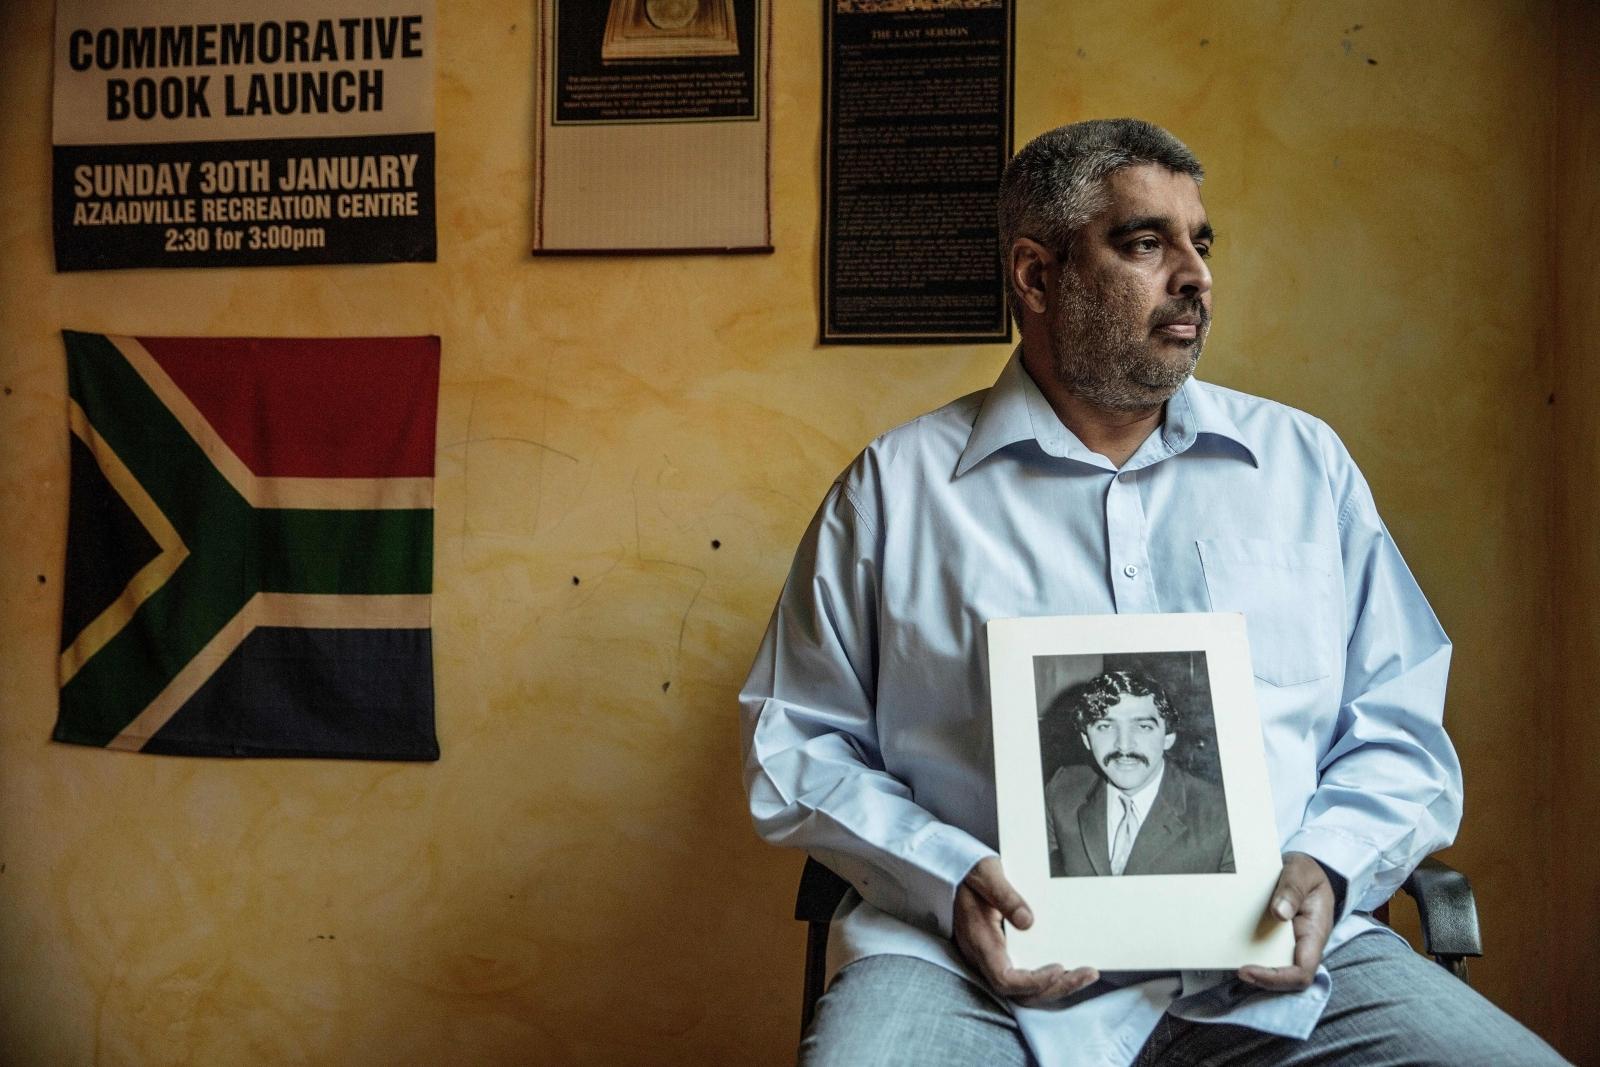 Ahmed Timol Mohamed Timol South Africa Apartheid